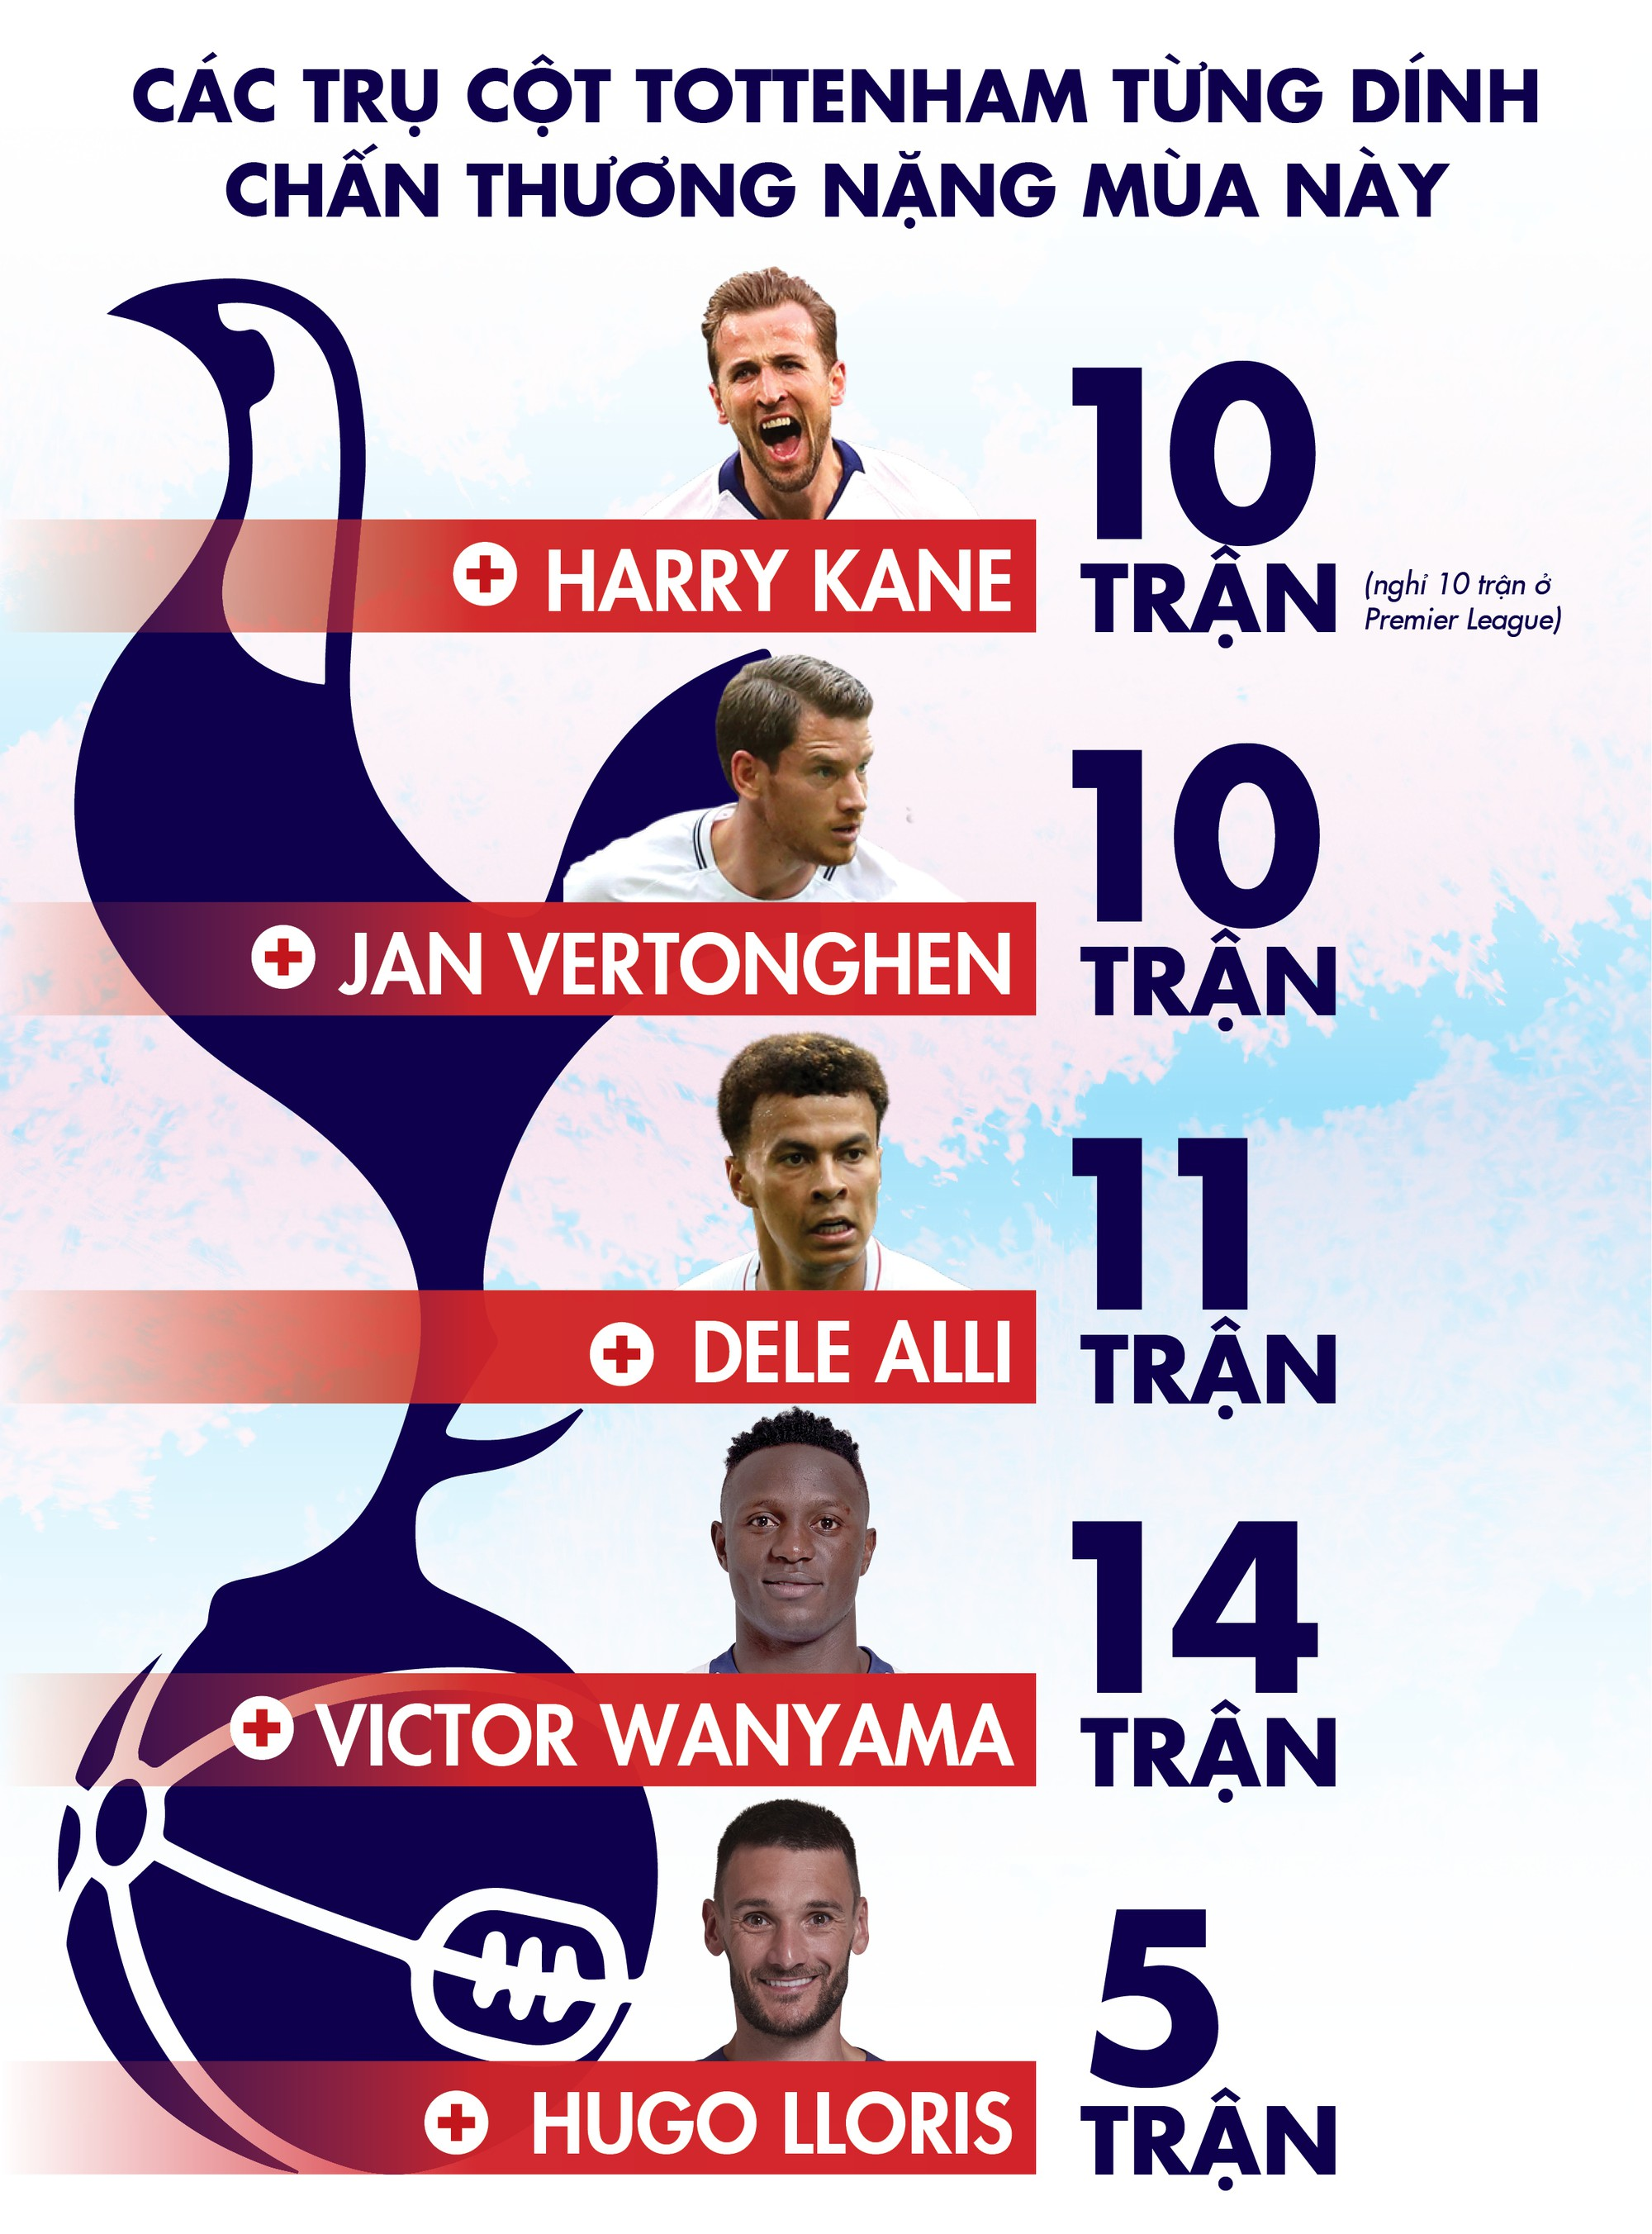 Tottenham - Truyện cổ kiểu Anh - Ảnh 3.